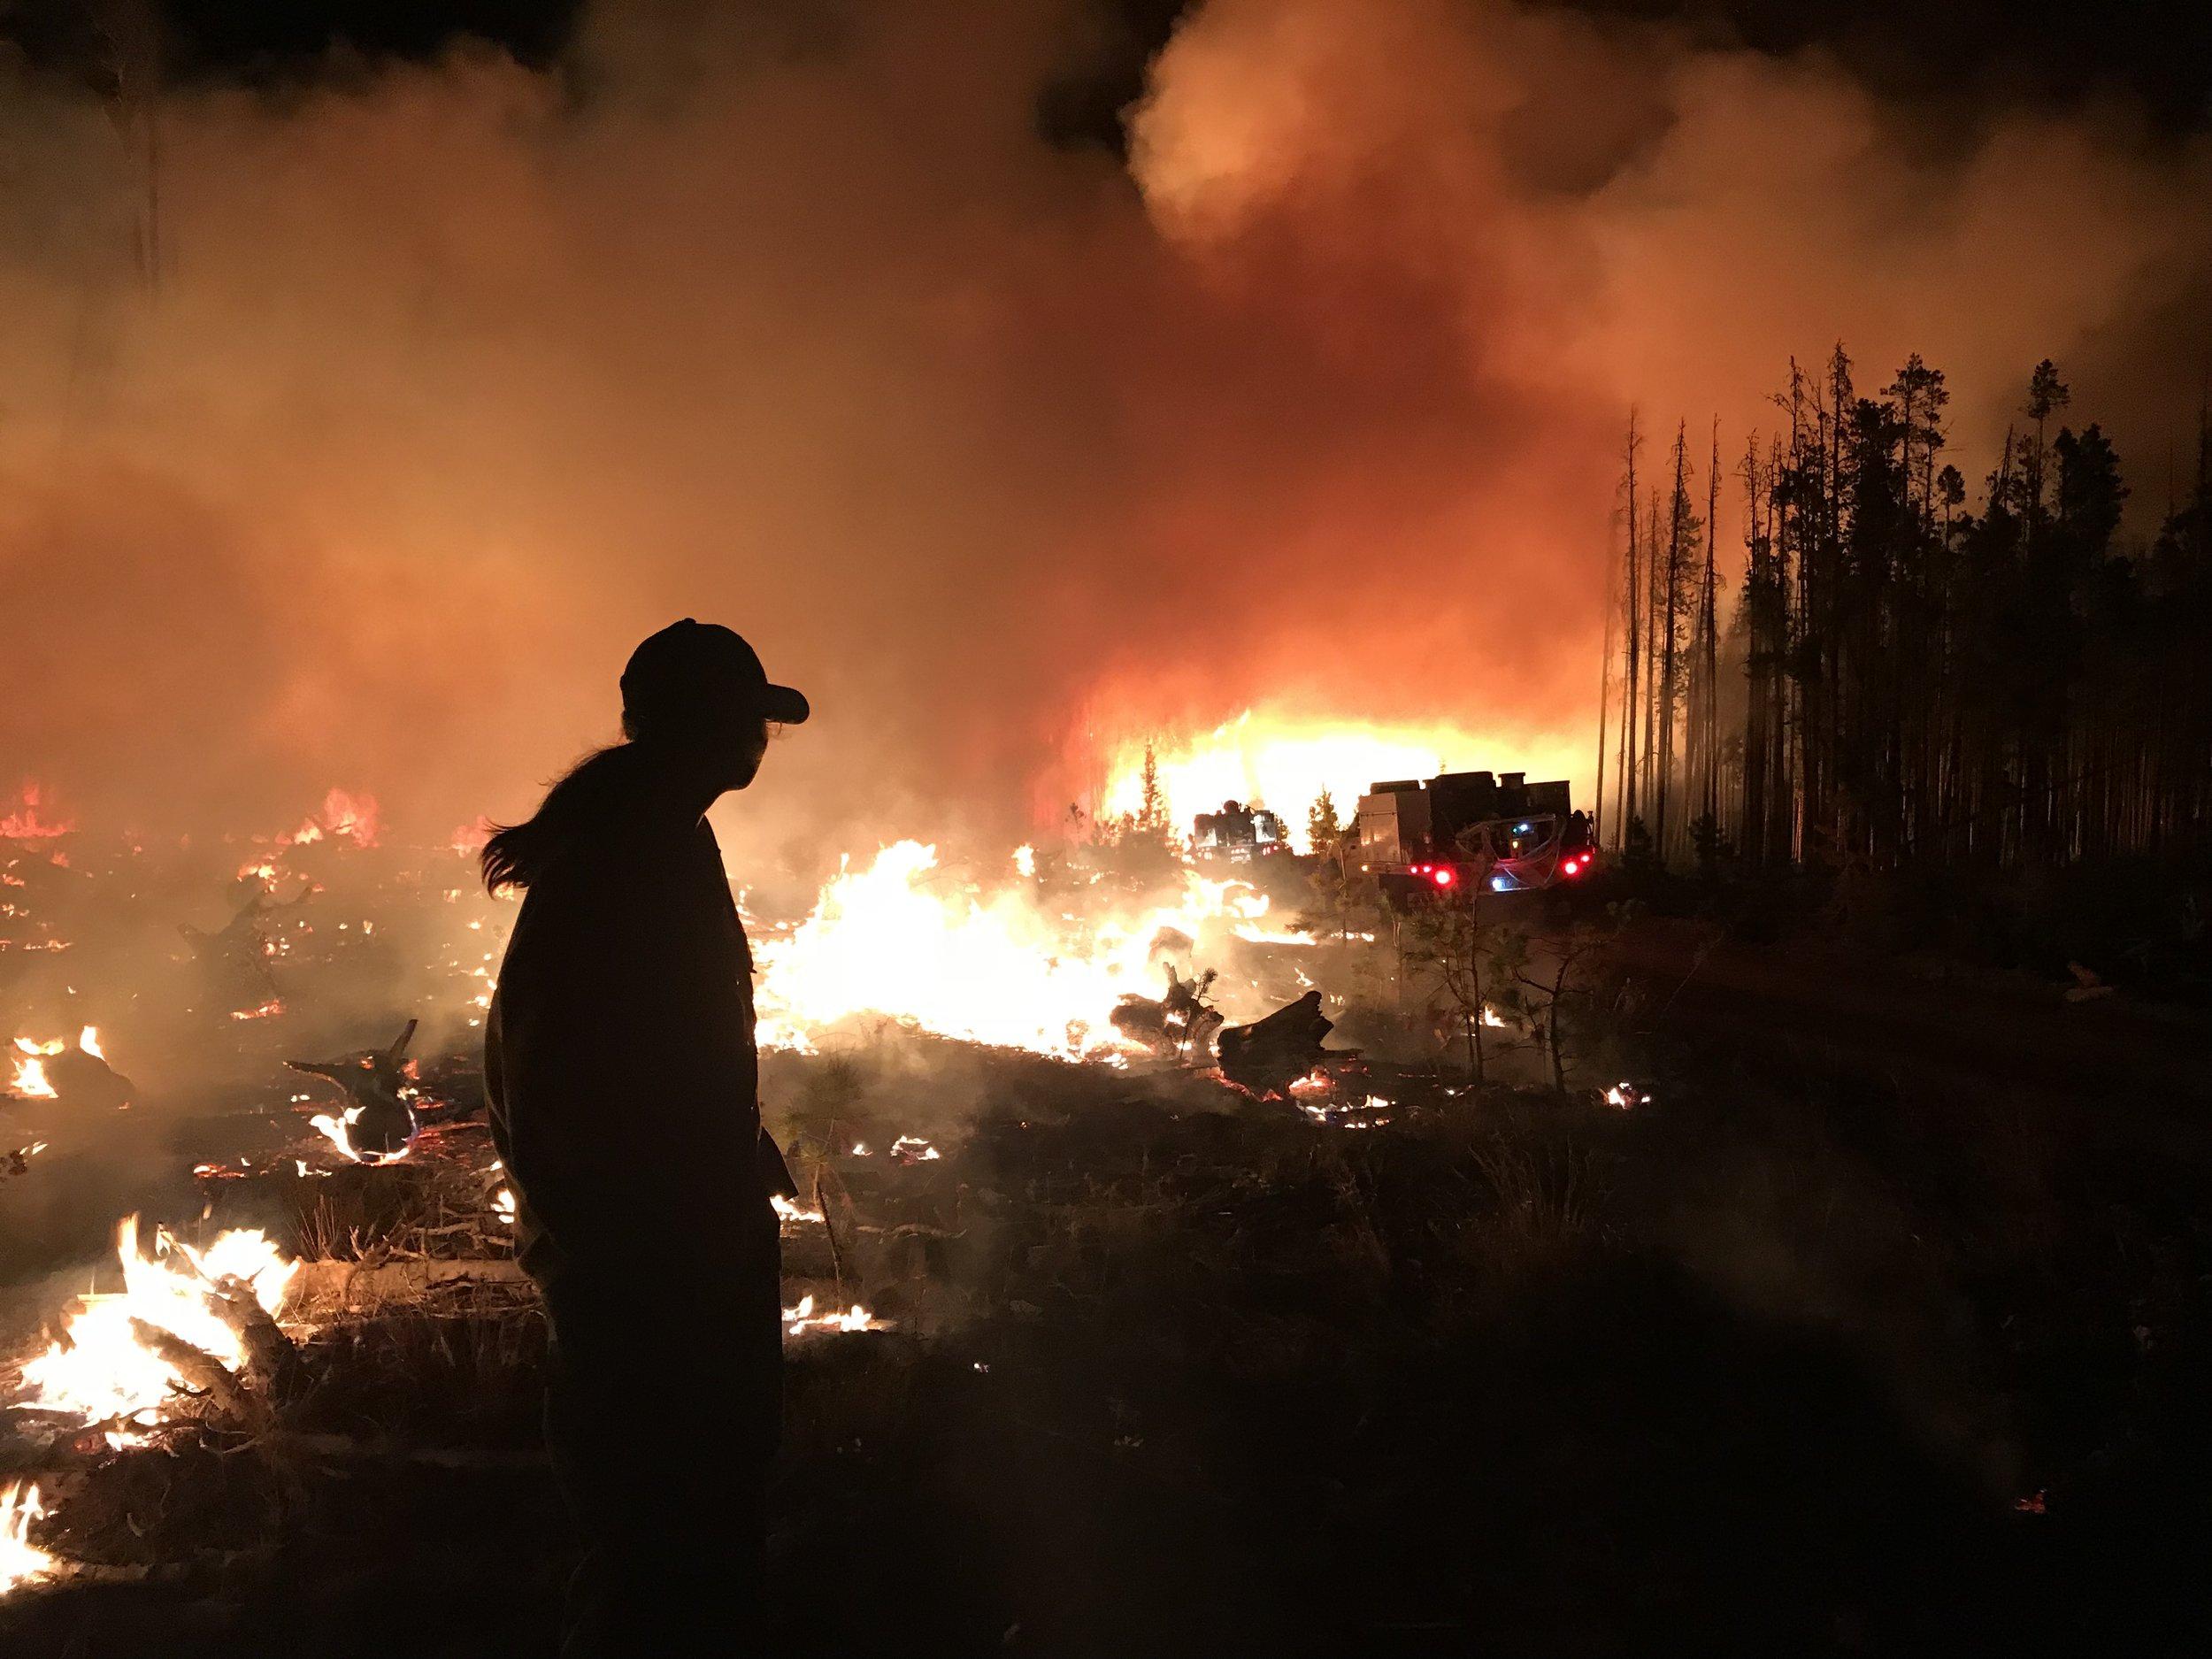 Treasure Valley Fire Wildland Fire Services